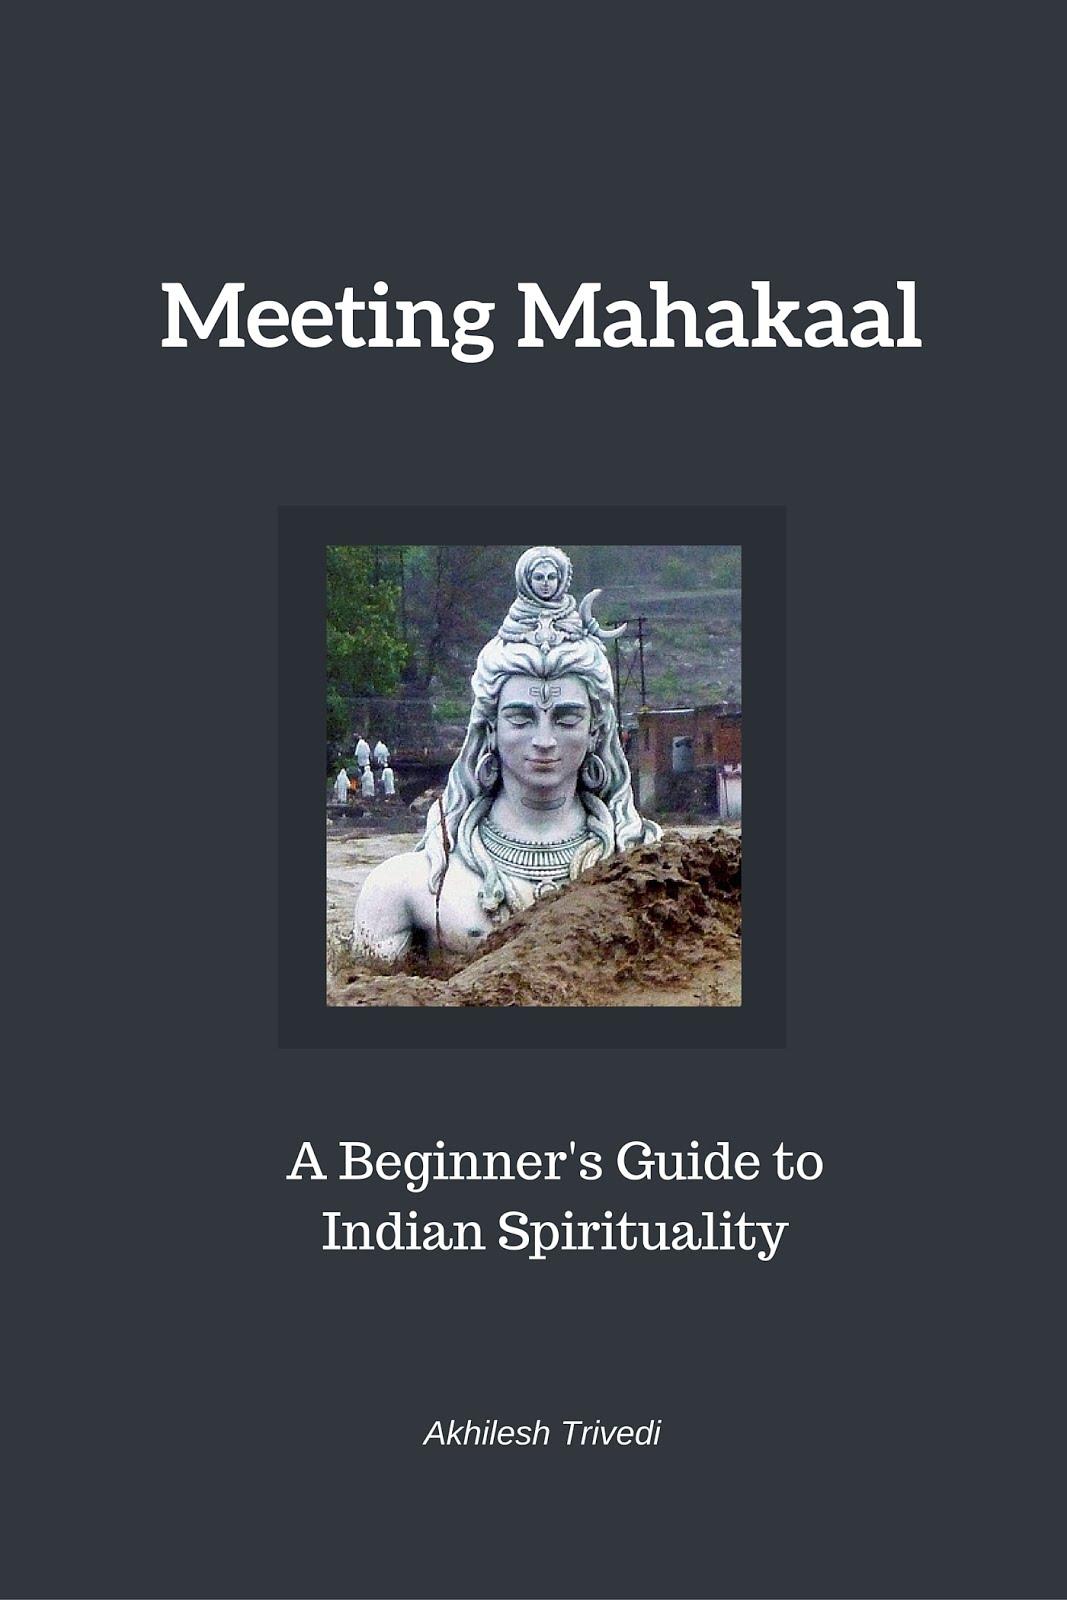 Meeting Mahakaal